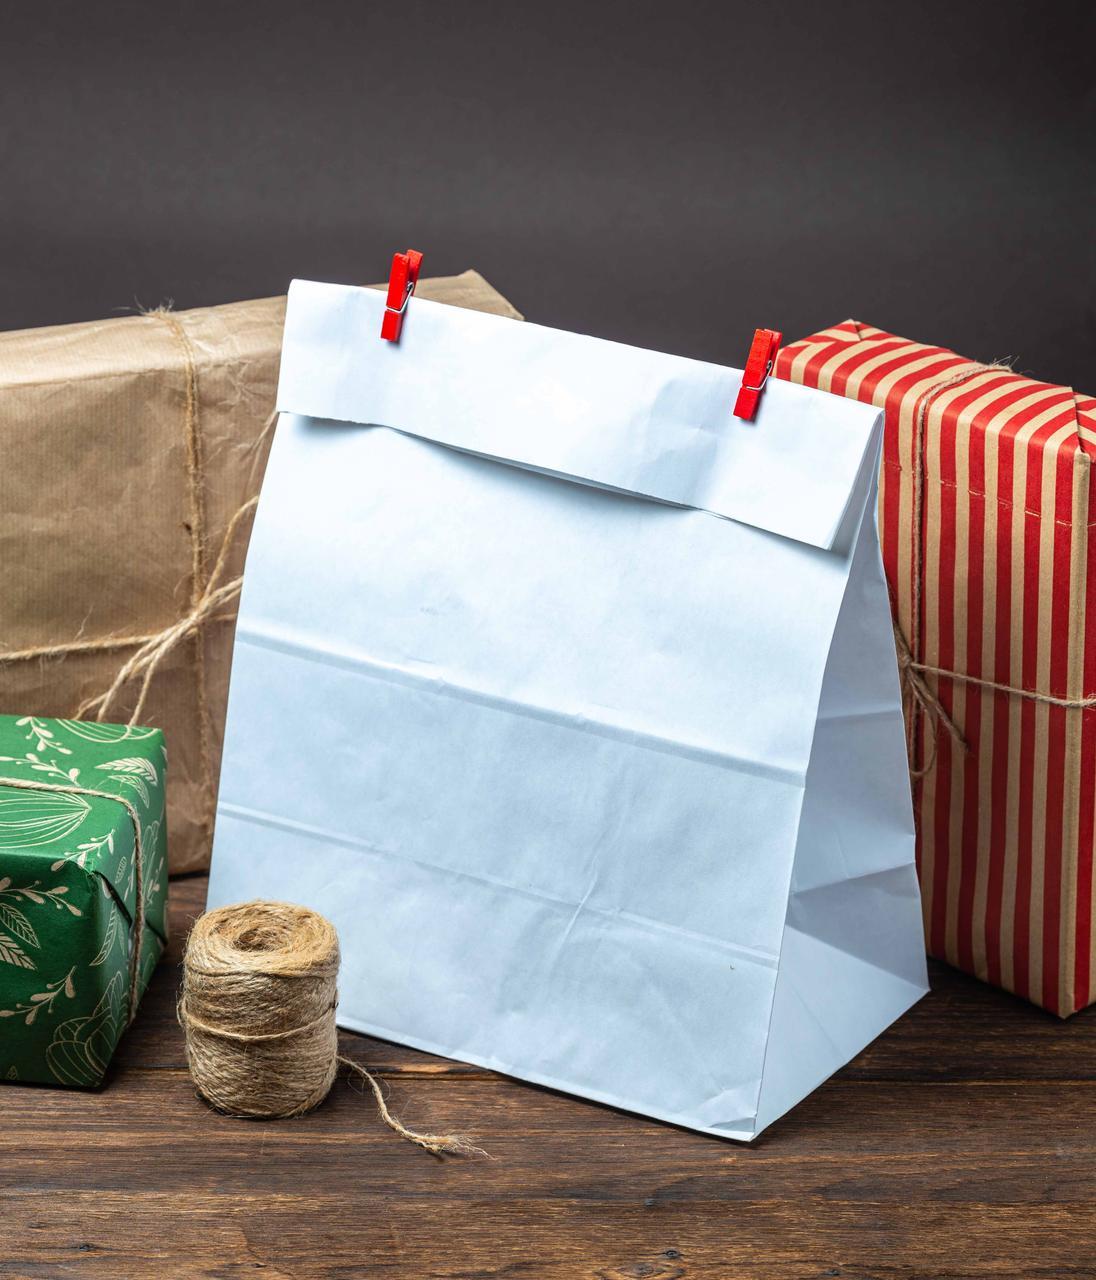 Пакет паперовий білий 150*90*240 мм крафт пакет з плоским дном